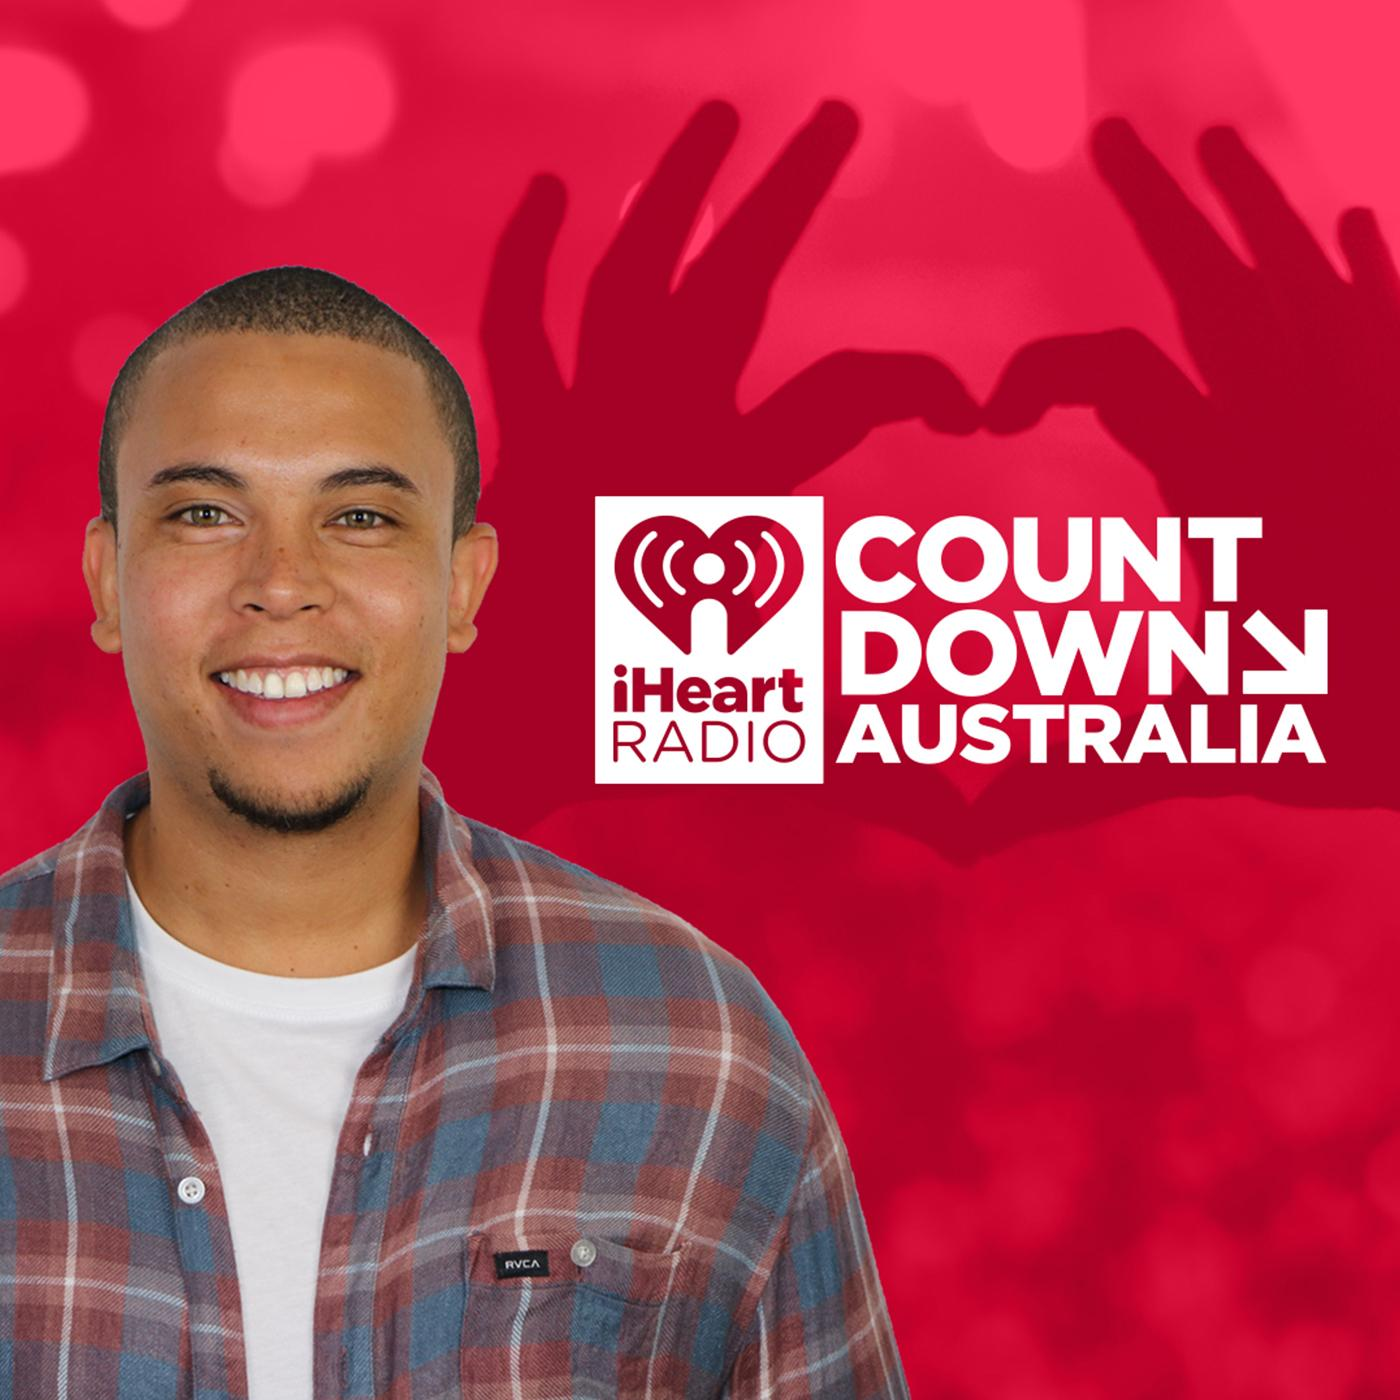 Ruel on The iHeart Radio Countdown - The iHeartRadio